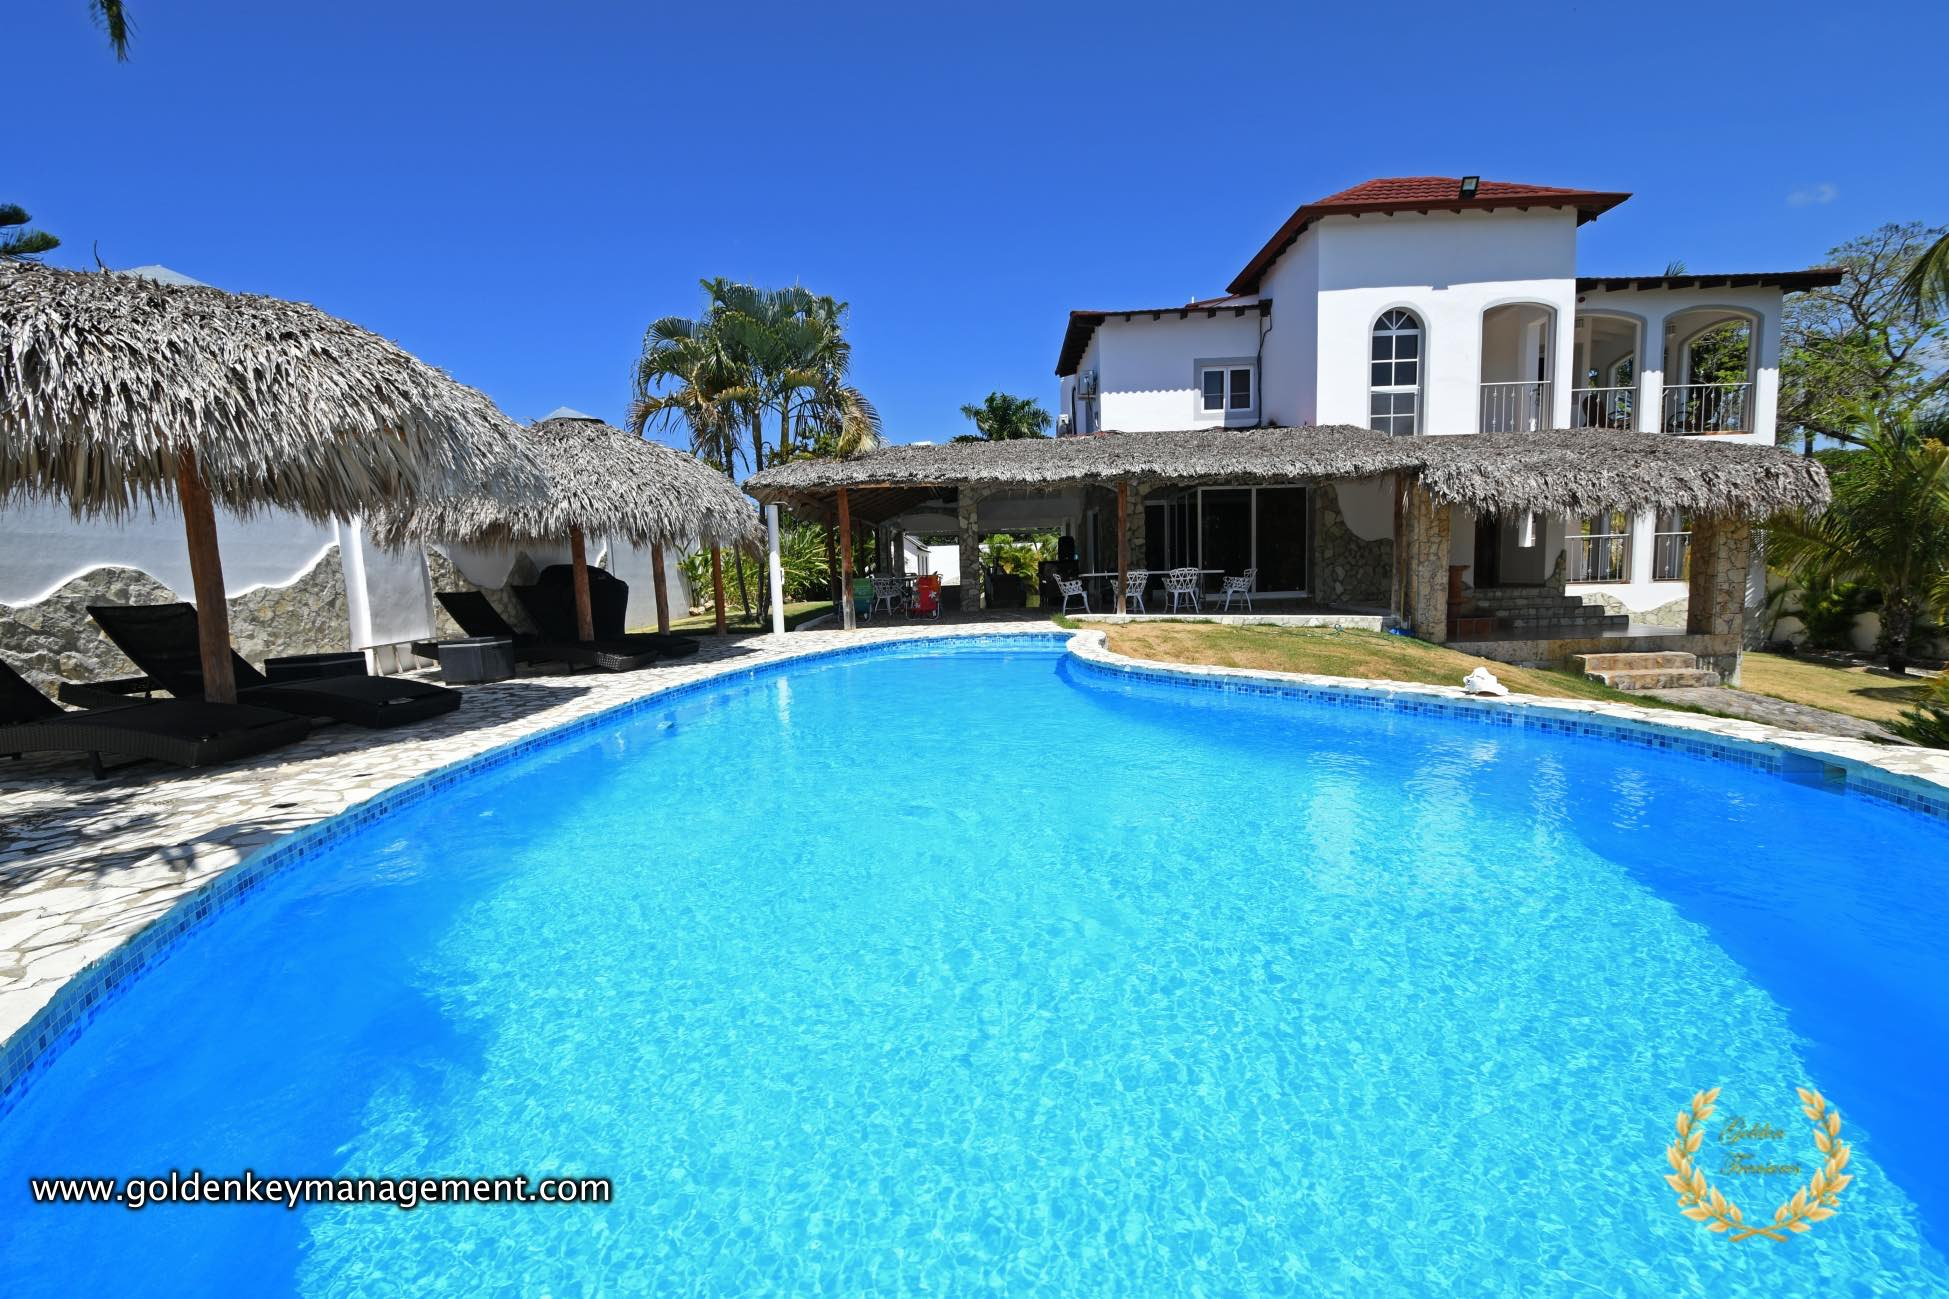 5 Bedroom Private Villa Rental Sosua